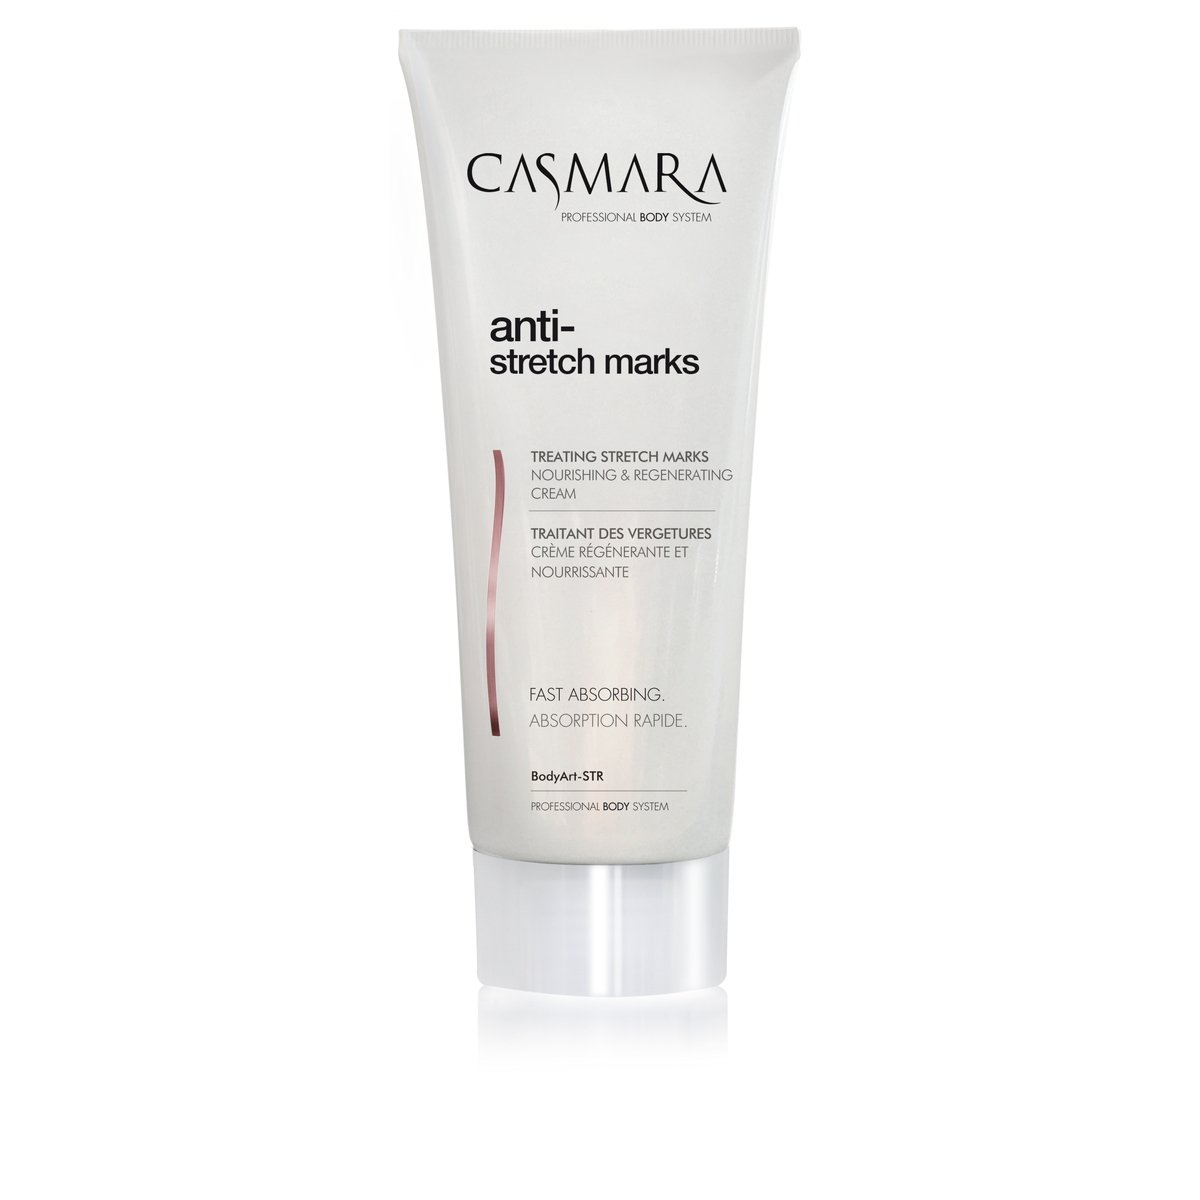 Amazon.com : Casmara Anti-Stretch Marks 200 ml Nourishing Regenerating Body Cream : Beauty